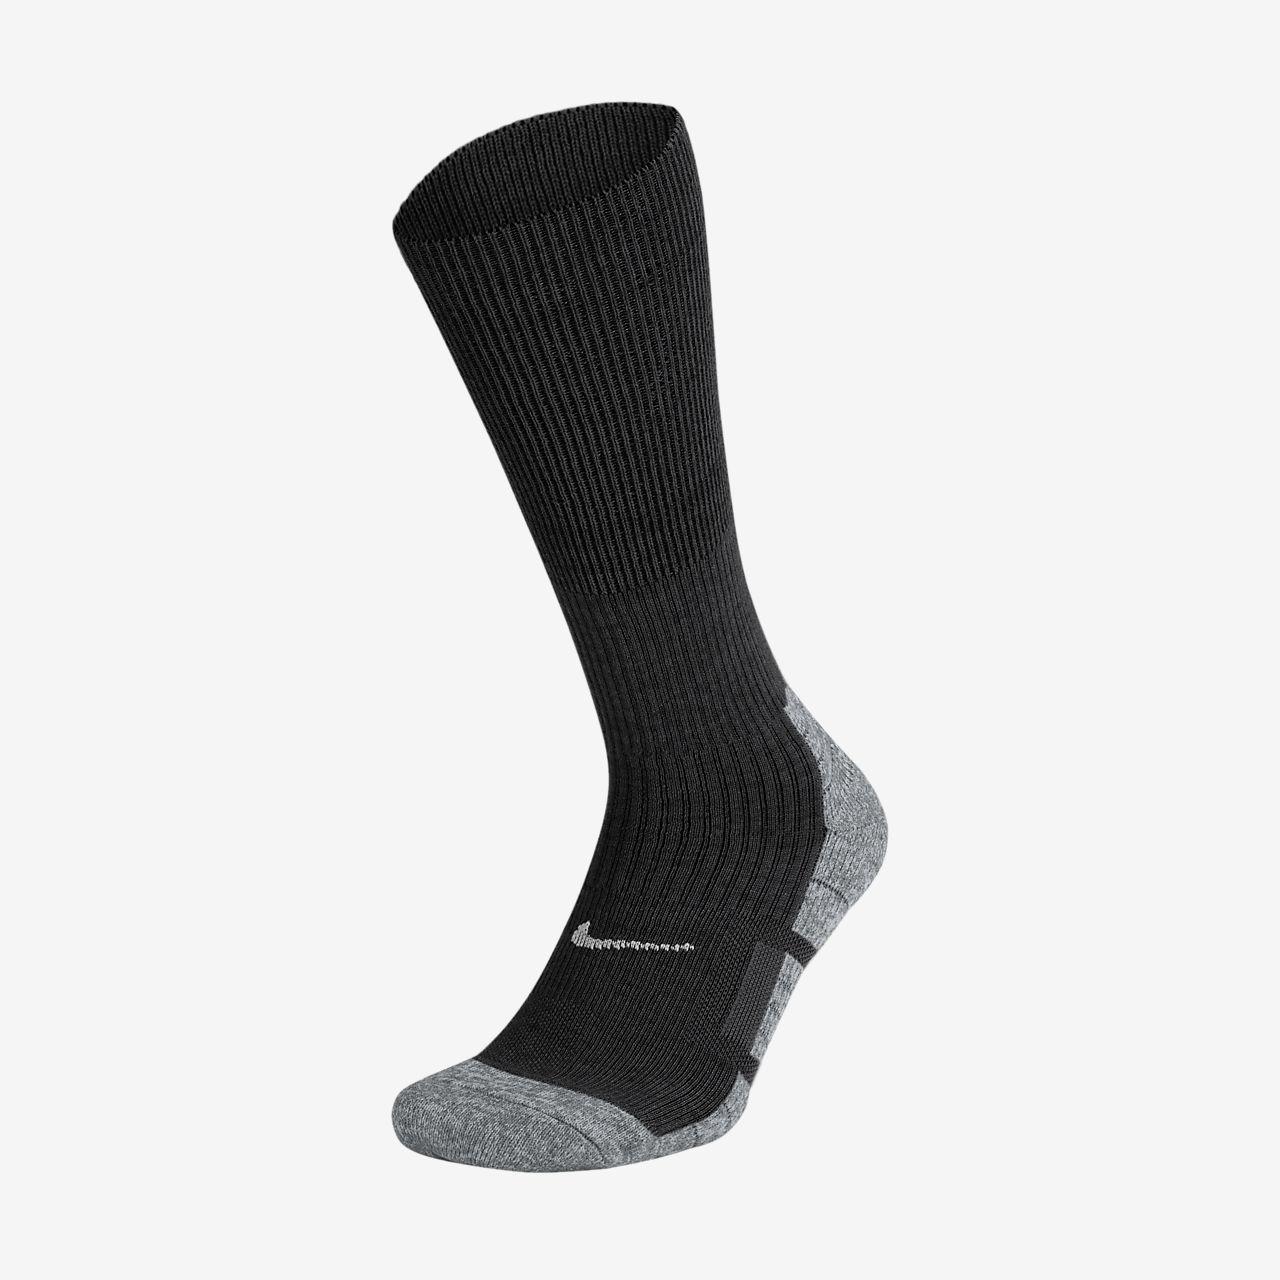 7816762594b Low Resolution Nike Special Field Socks Nike Special Field Socks